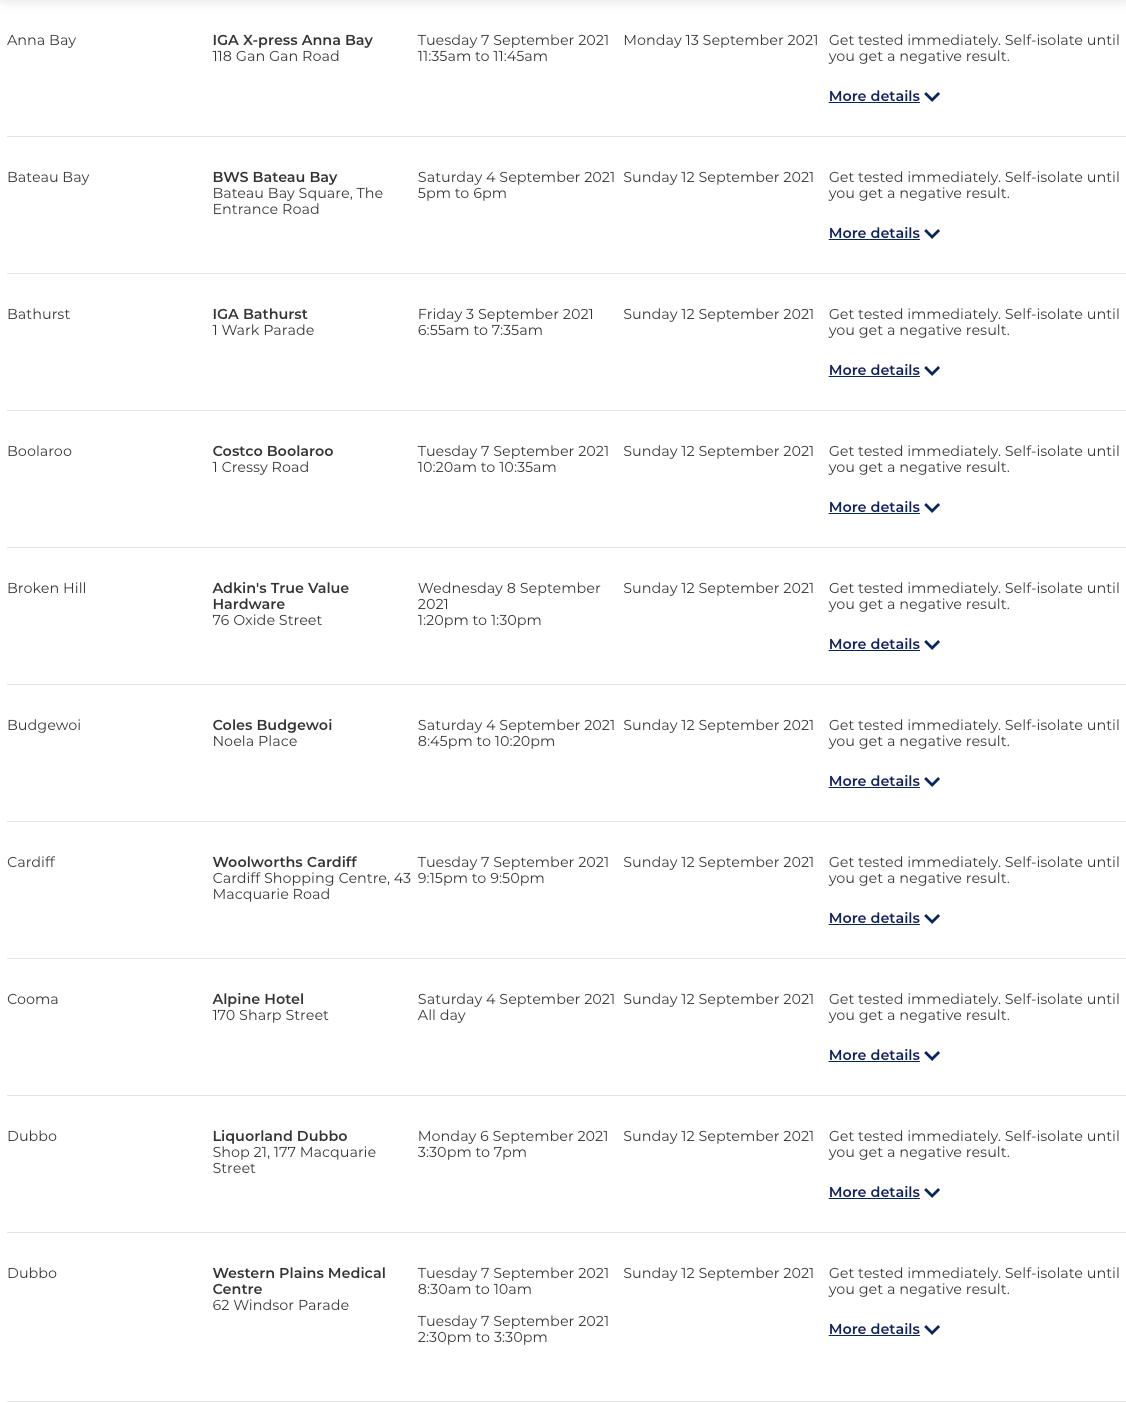 www.nsw.gov.au_covid-19_nsw-covid-19-case-locations_case-locations (28)的副本.png